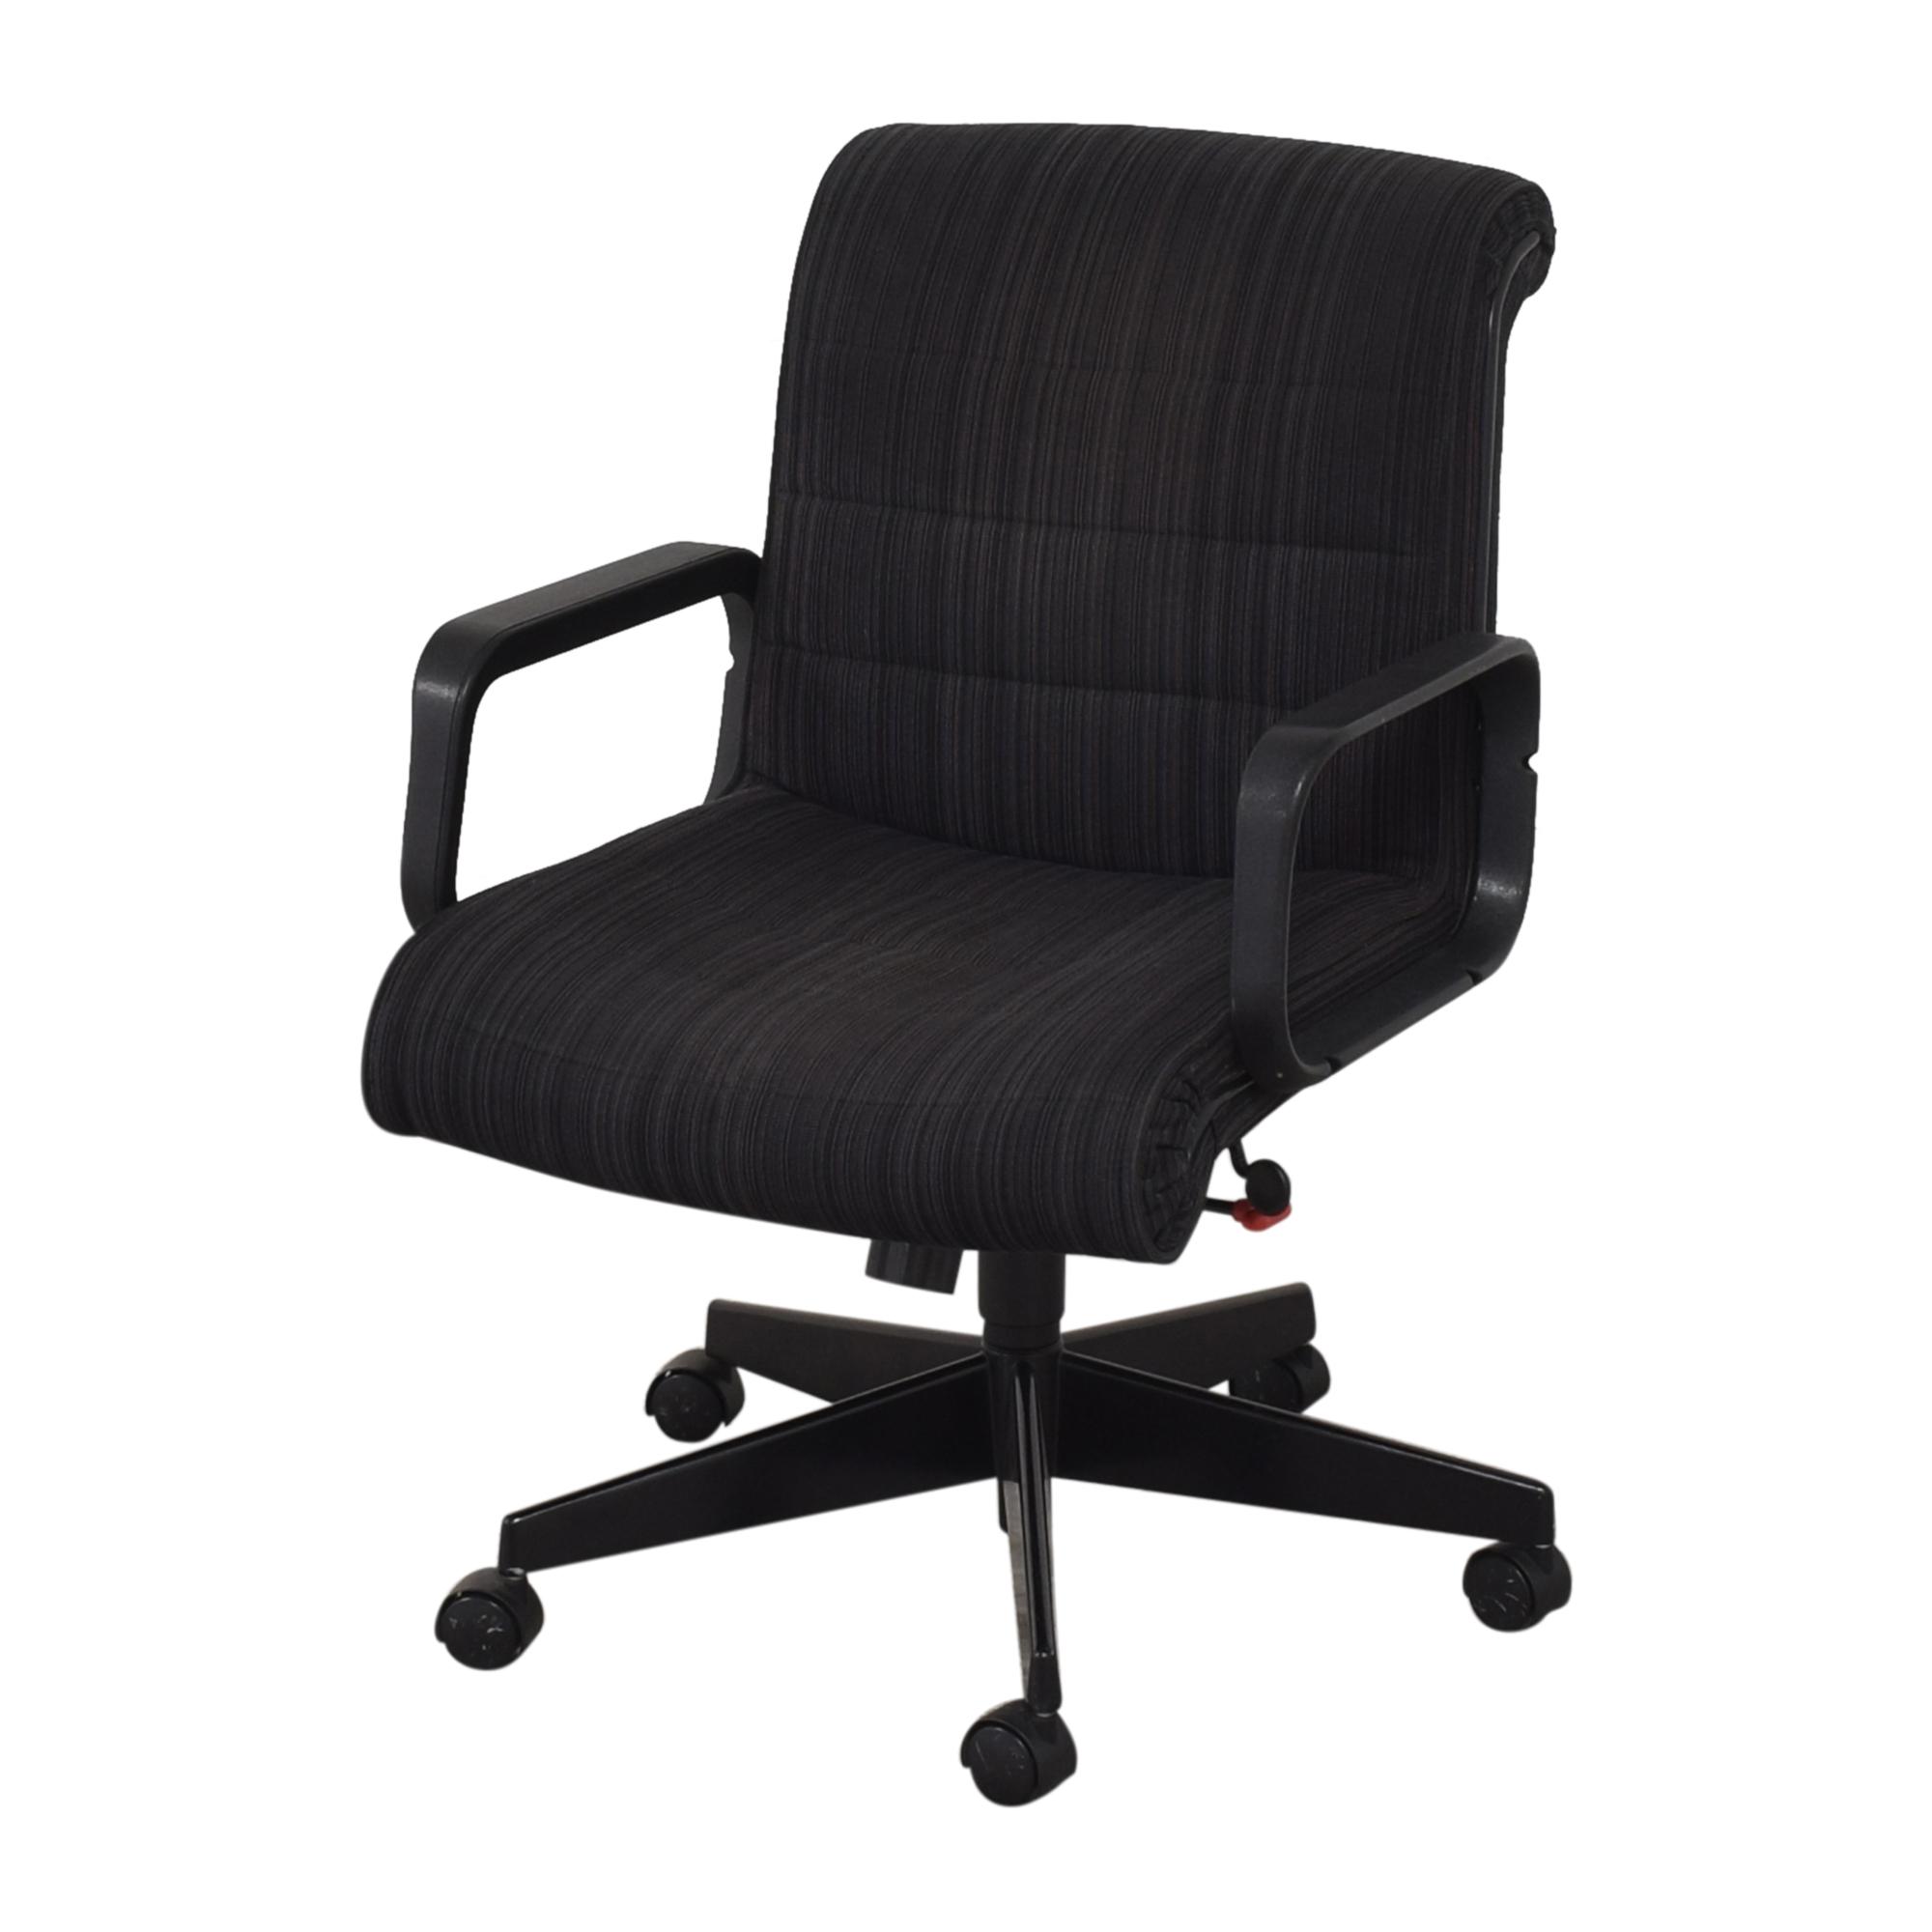 buy Knoll Knoll Richard Sapper Desk Chair online